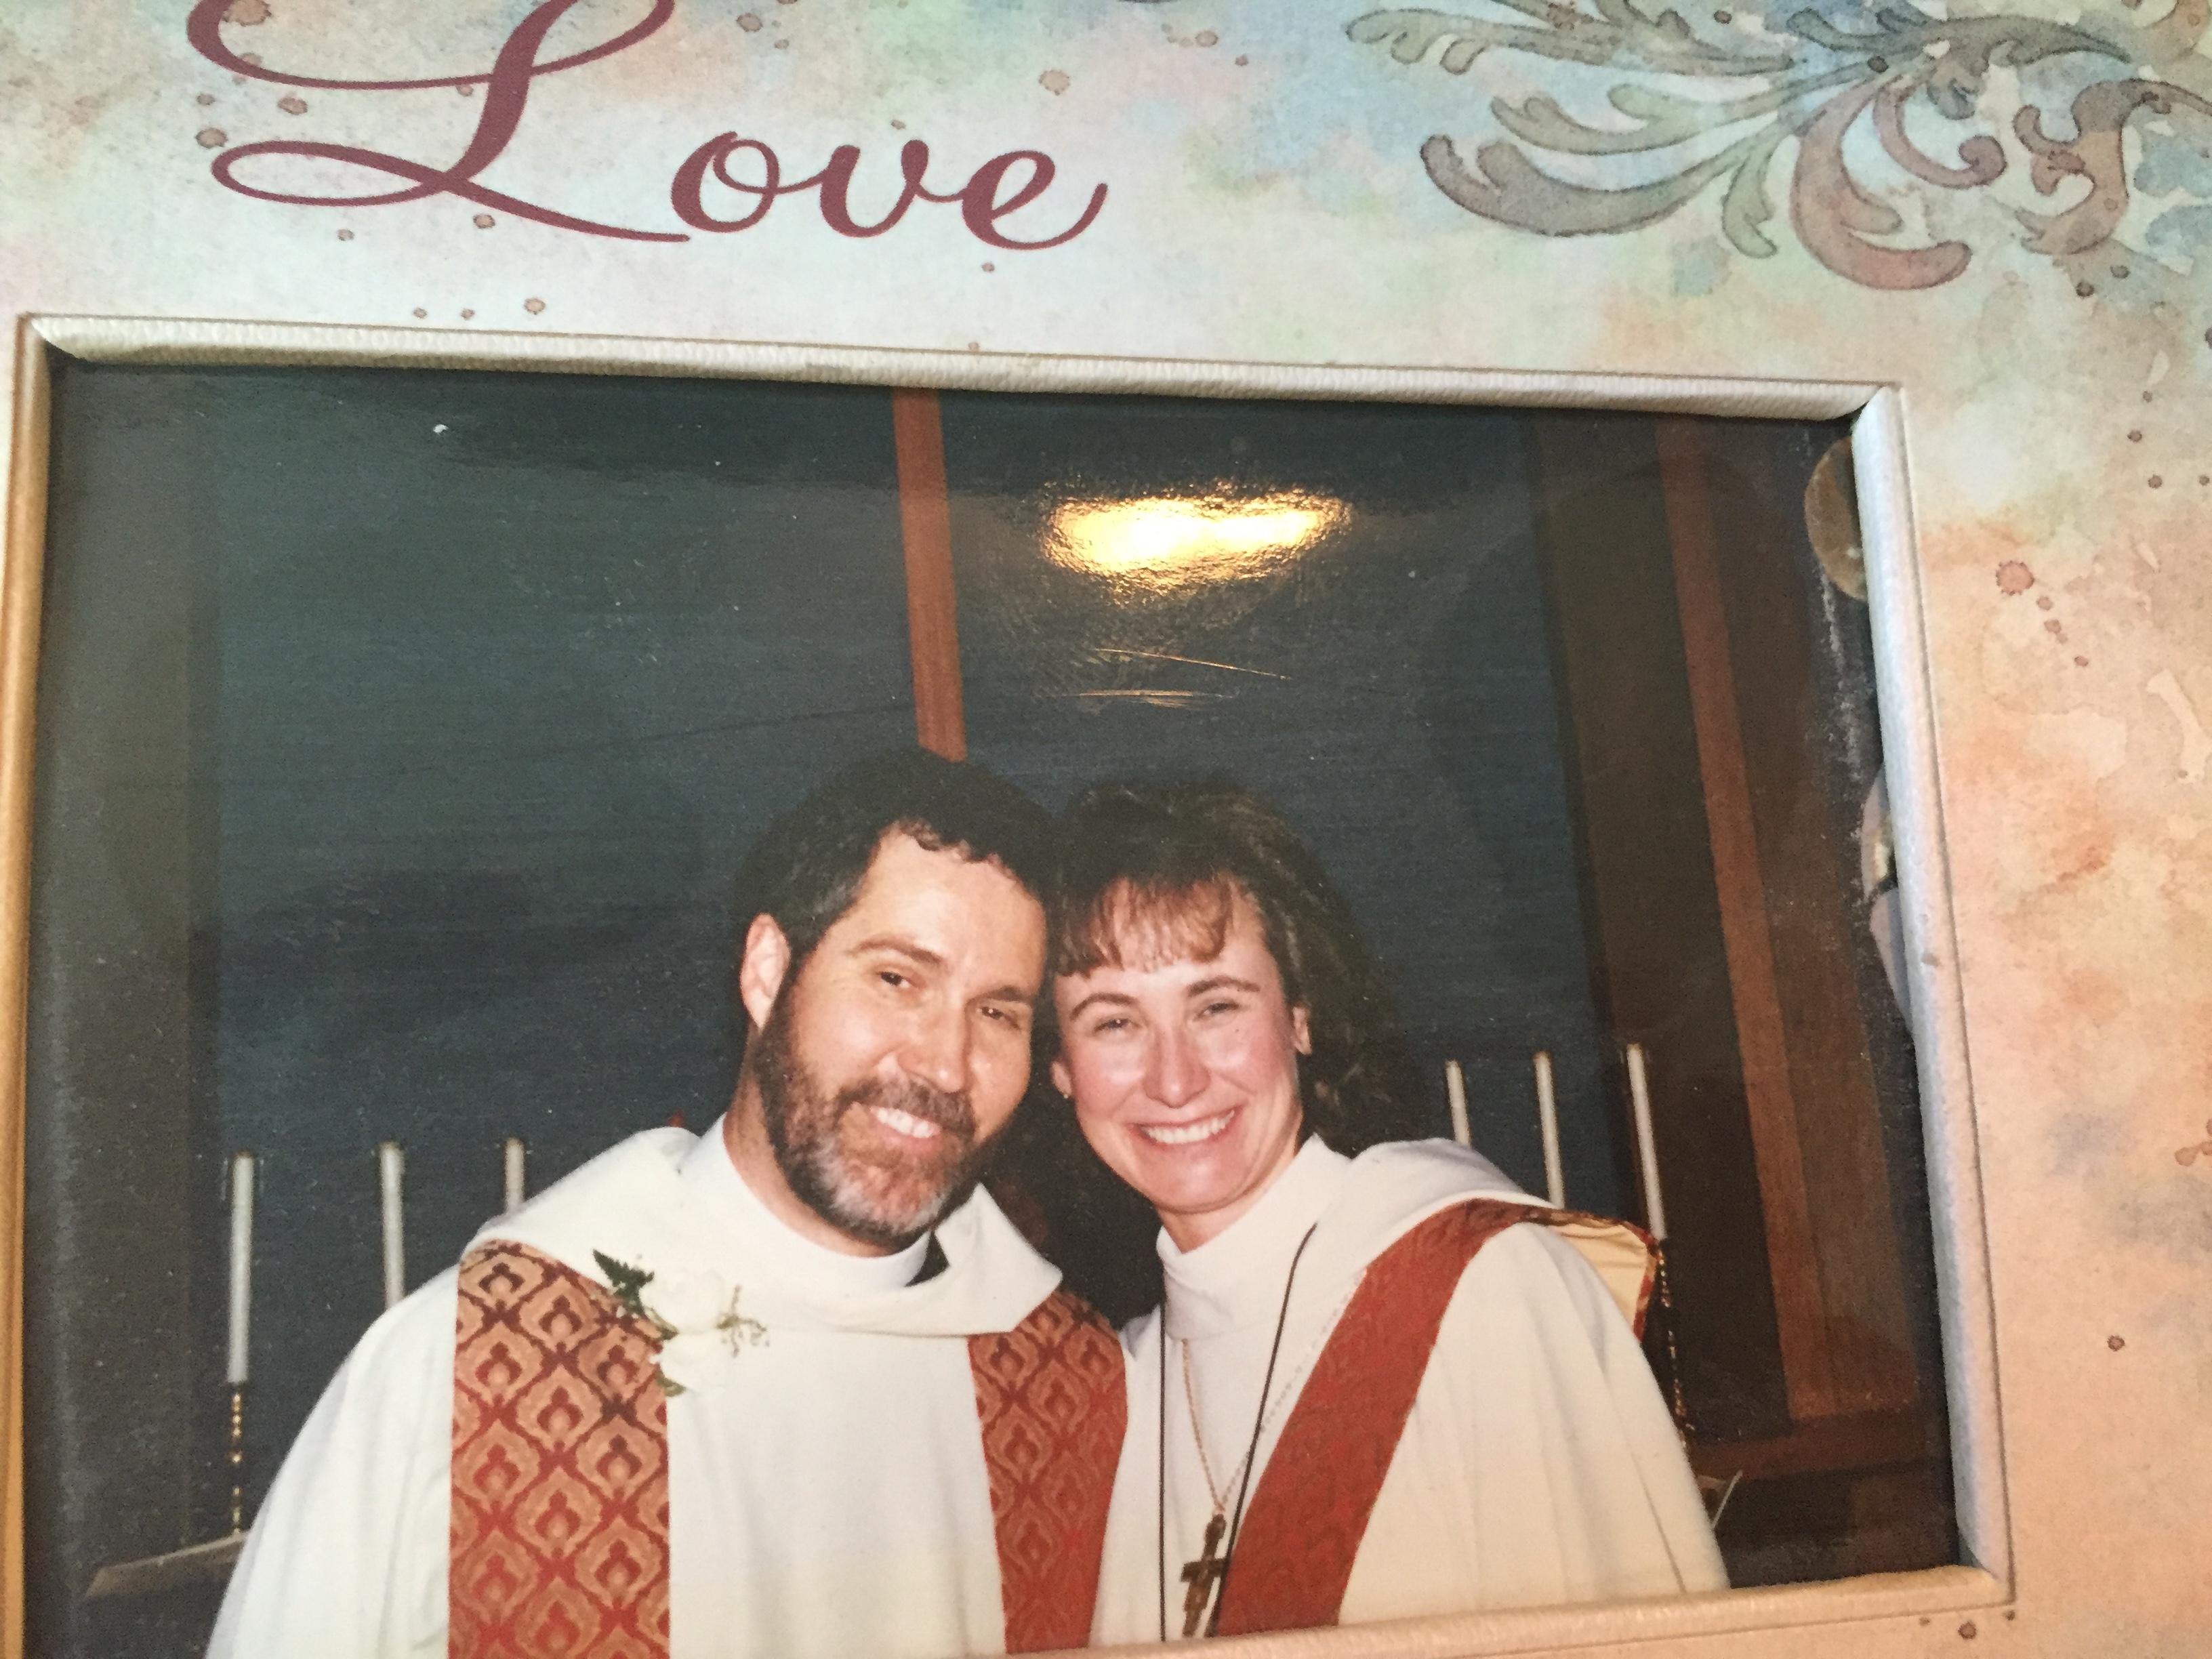 Father Doug Yarbrough